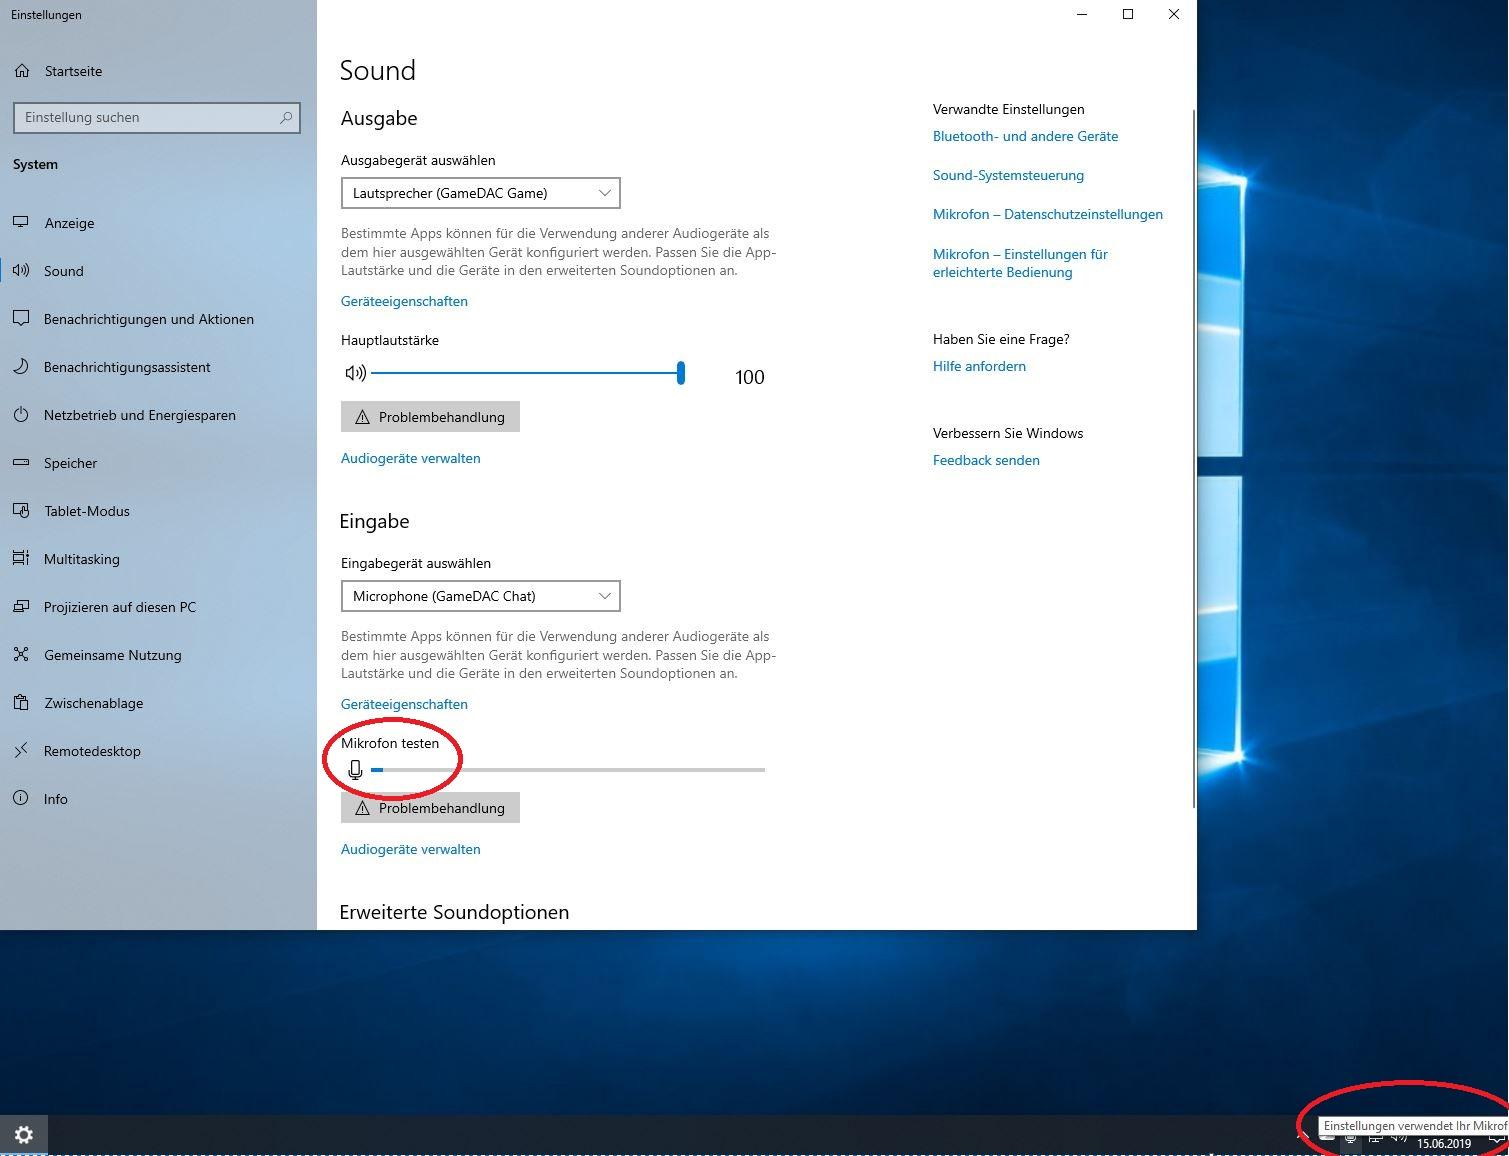 Discord aktiviert das Mikrofon nicht unter Windows 10 1903